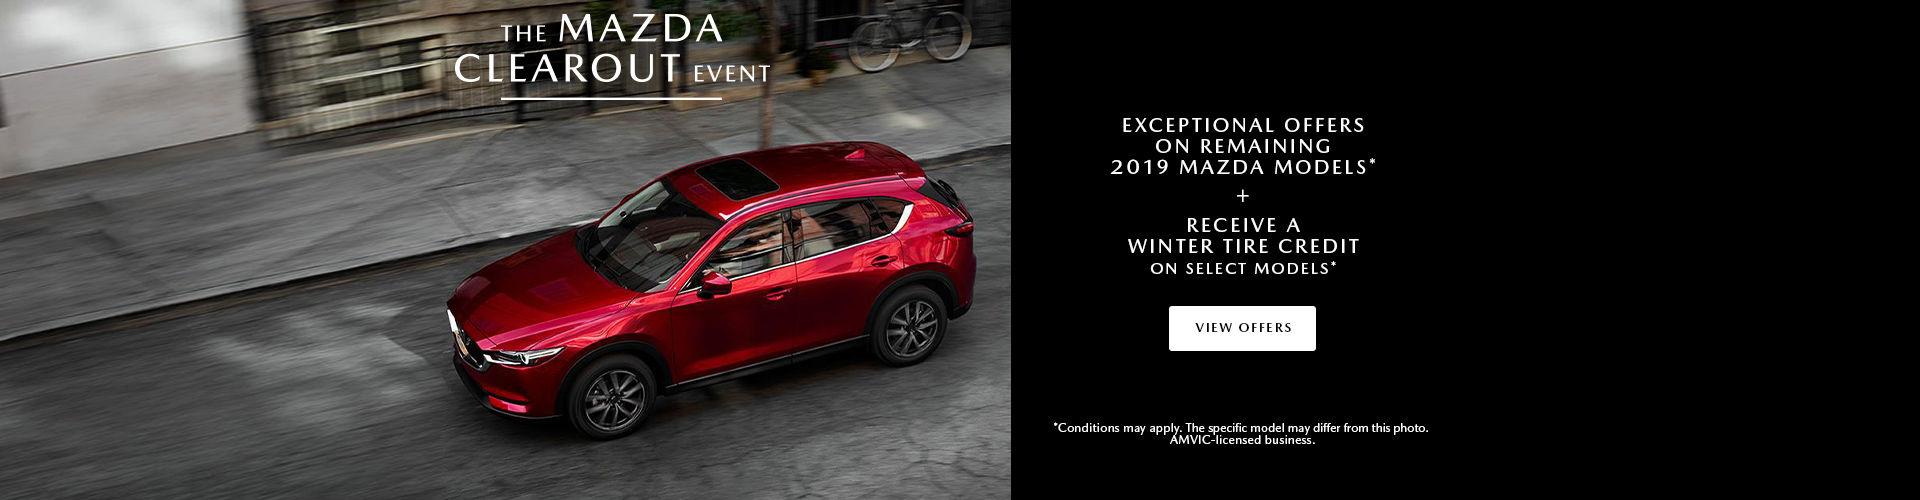 Mazda Clearout Event